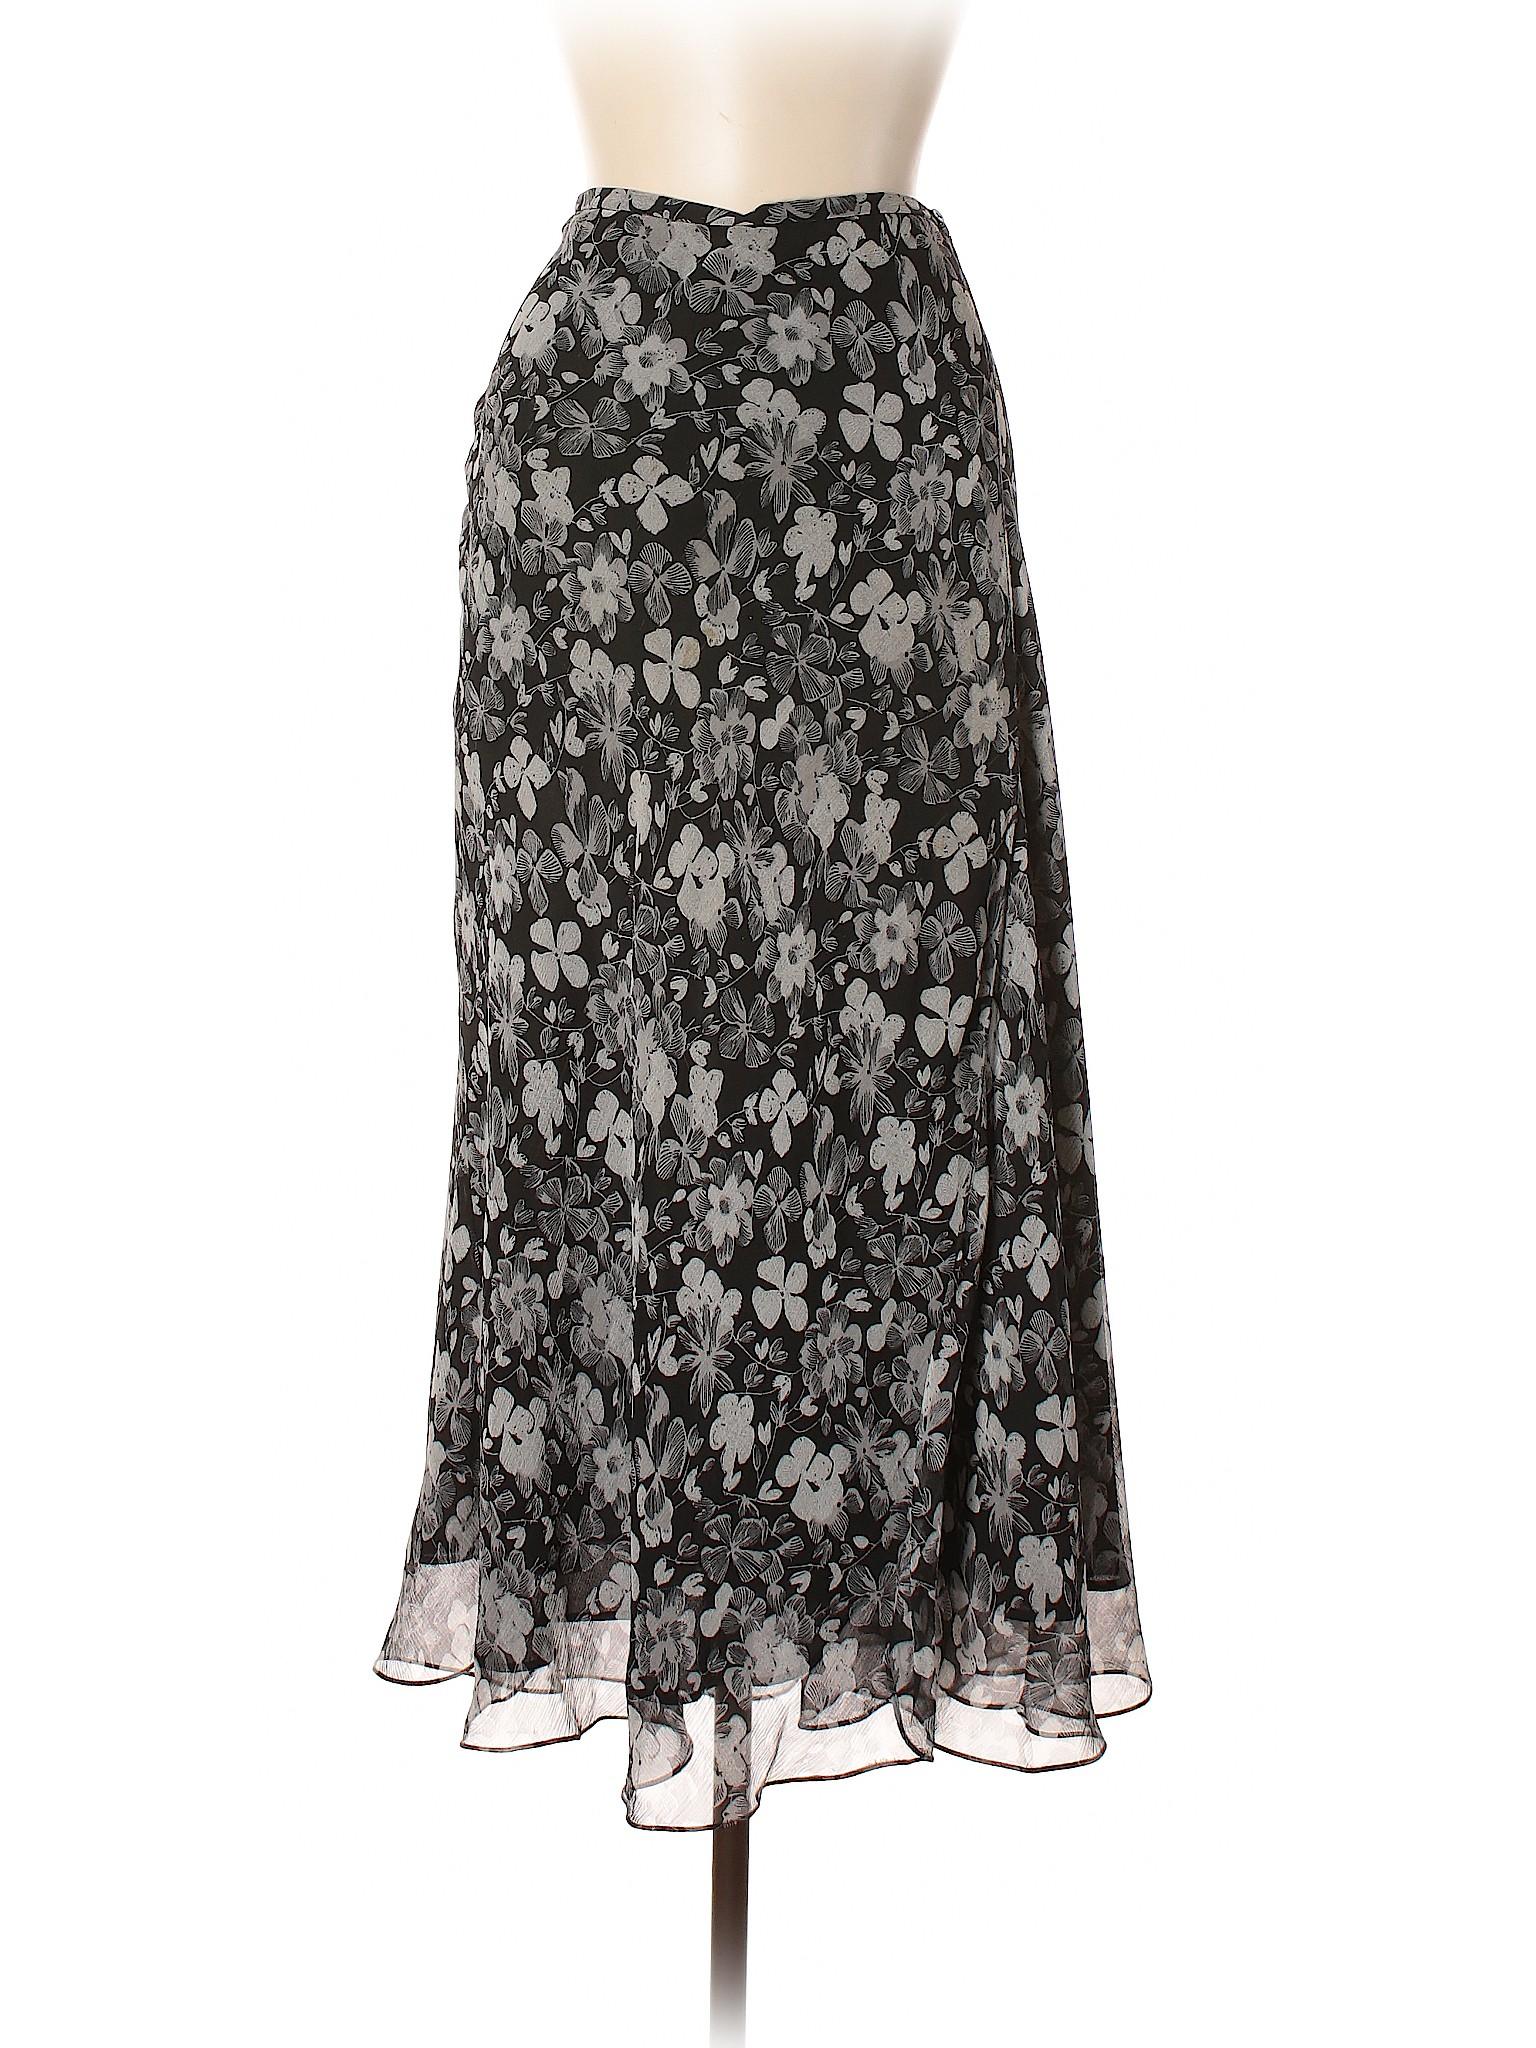 Silk leisure Club Charter Skirt Boutique tR06qFWw